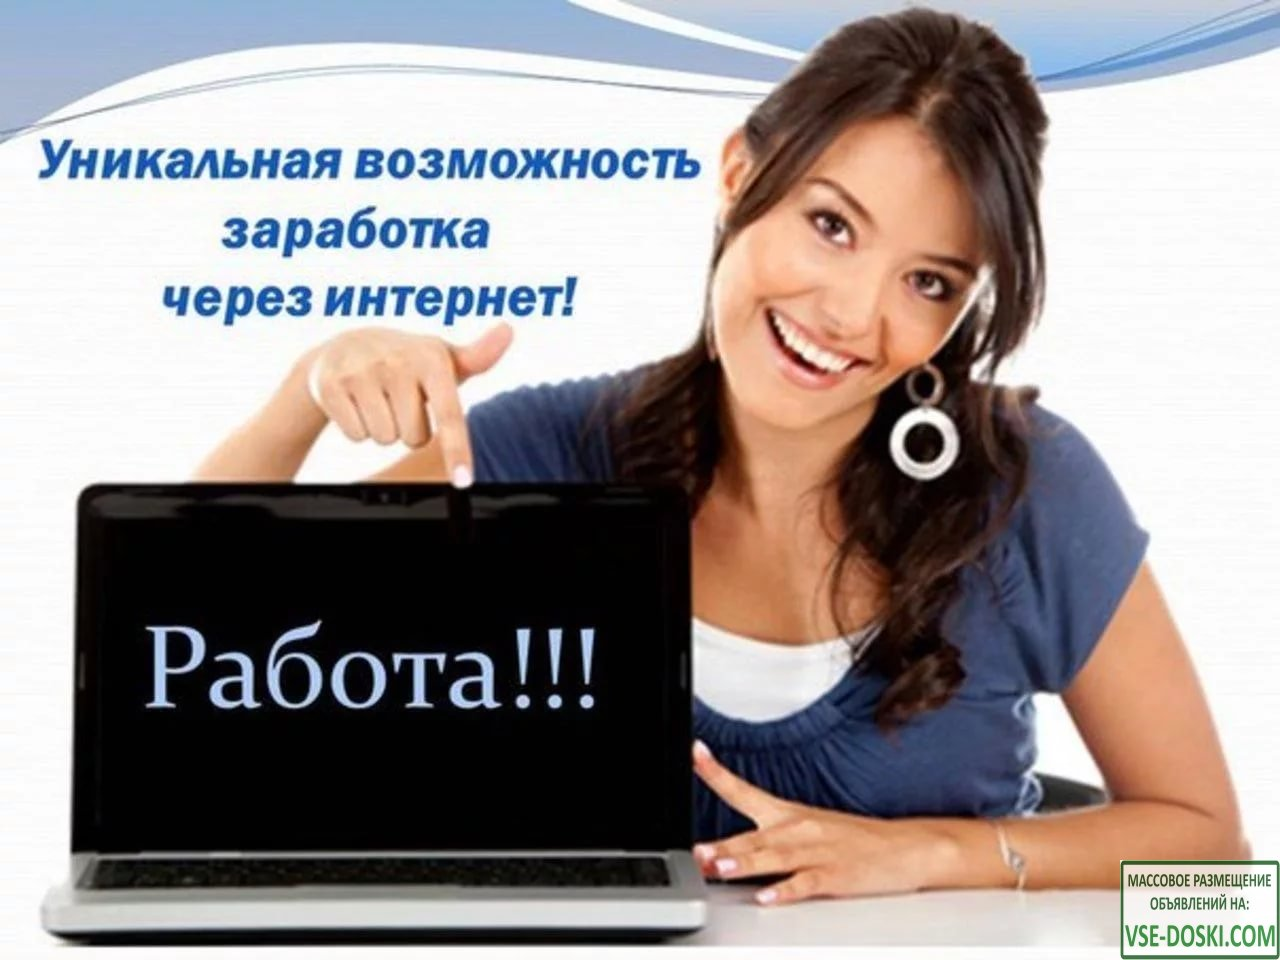 Консультант в интернет-магазин (работа на дому)